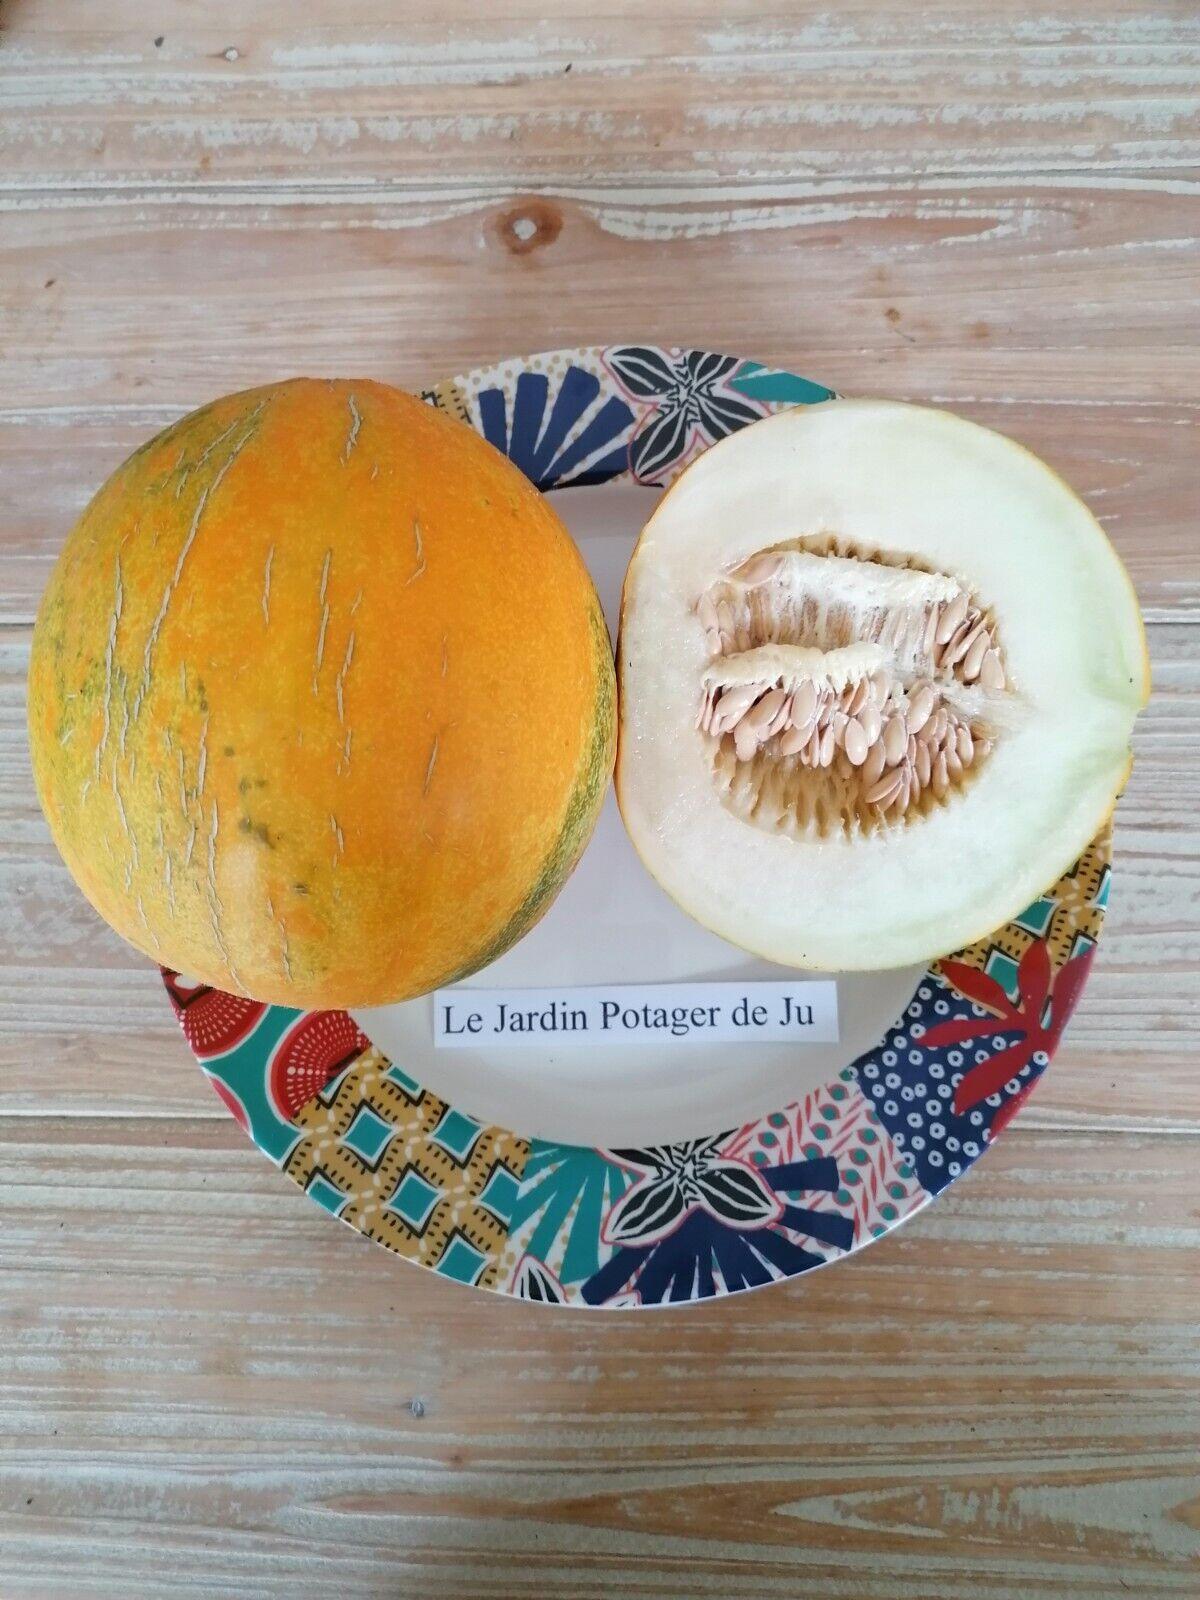 10 Seeds melon Kazakh Sensitive Darker Dryness 0,5 To 1,5 KG Rustic Juicy